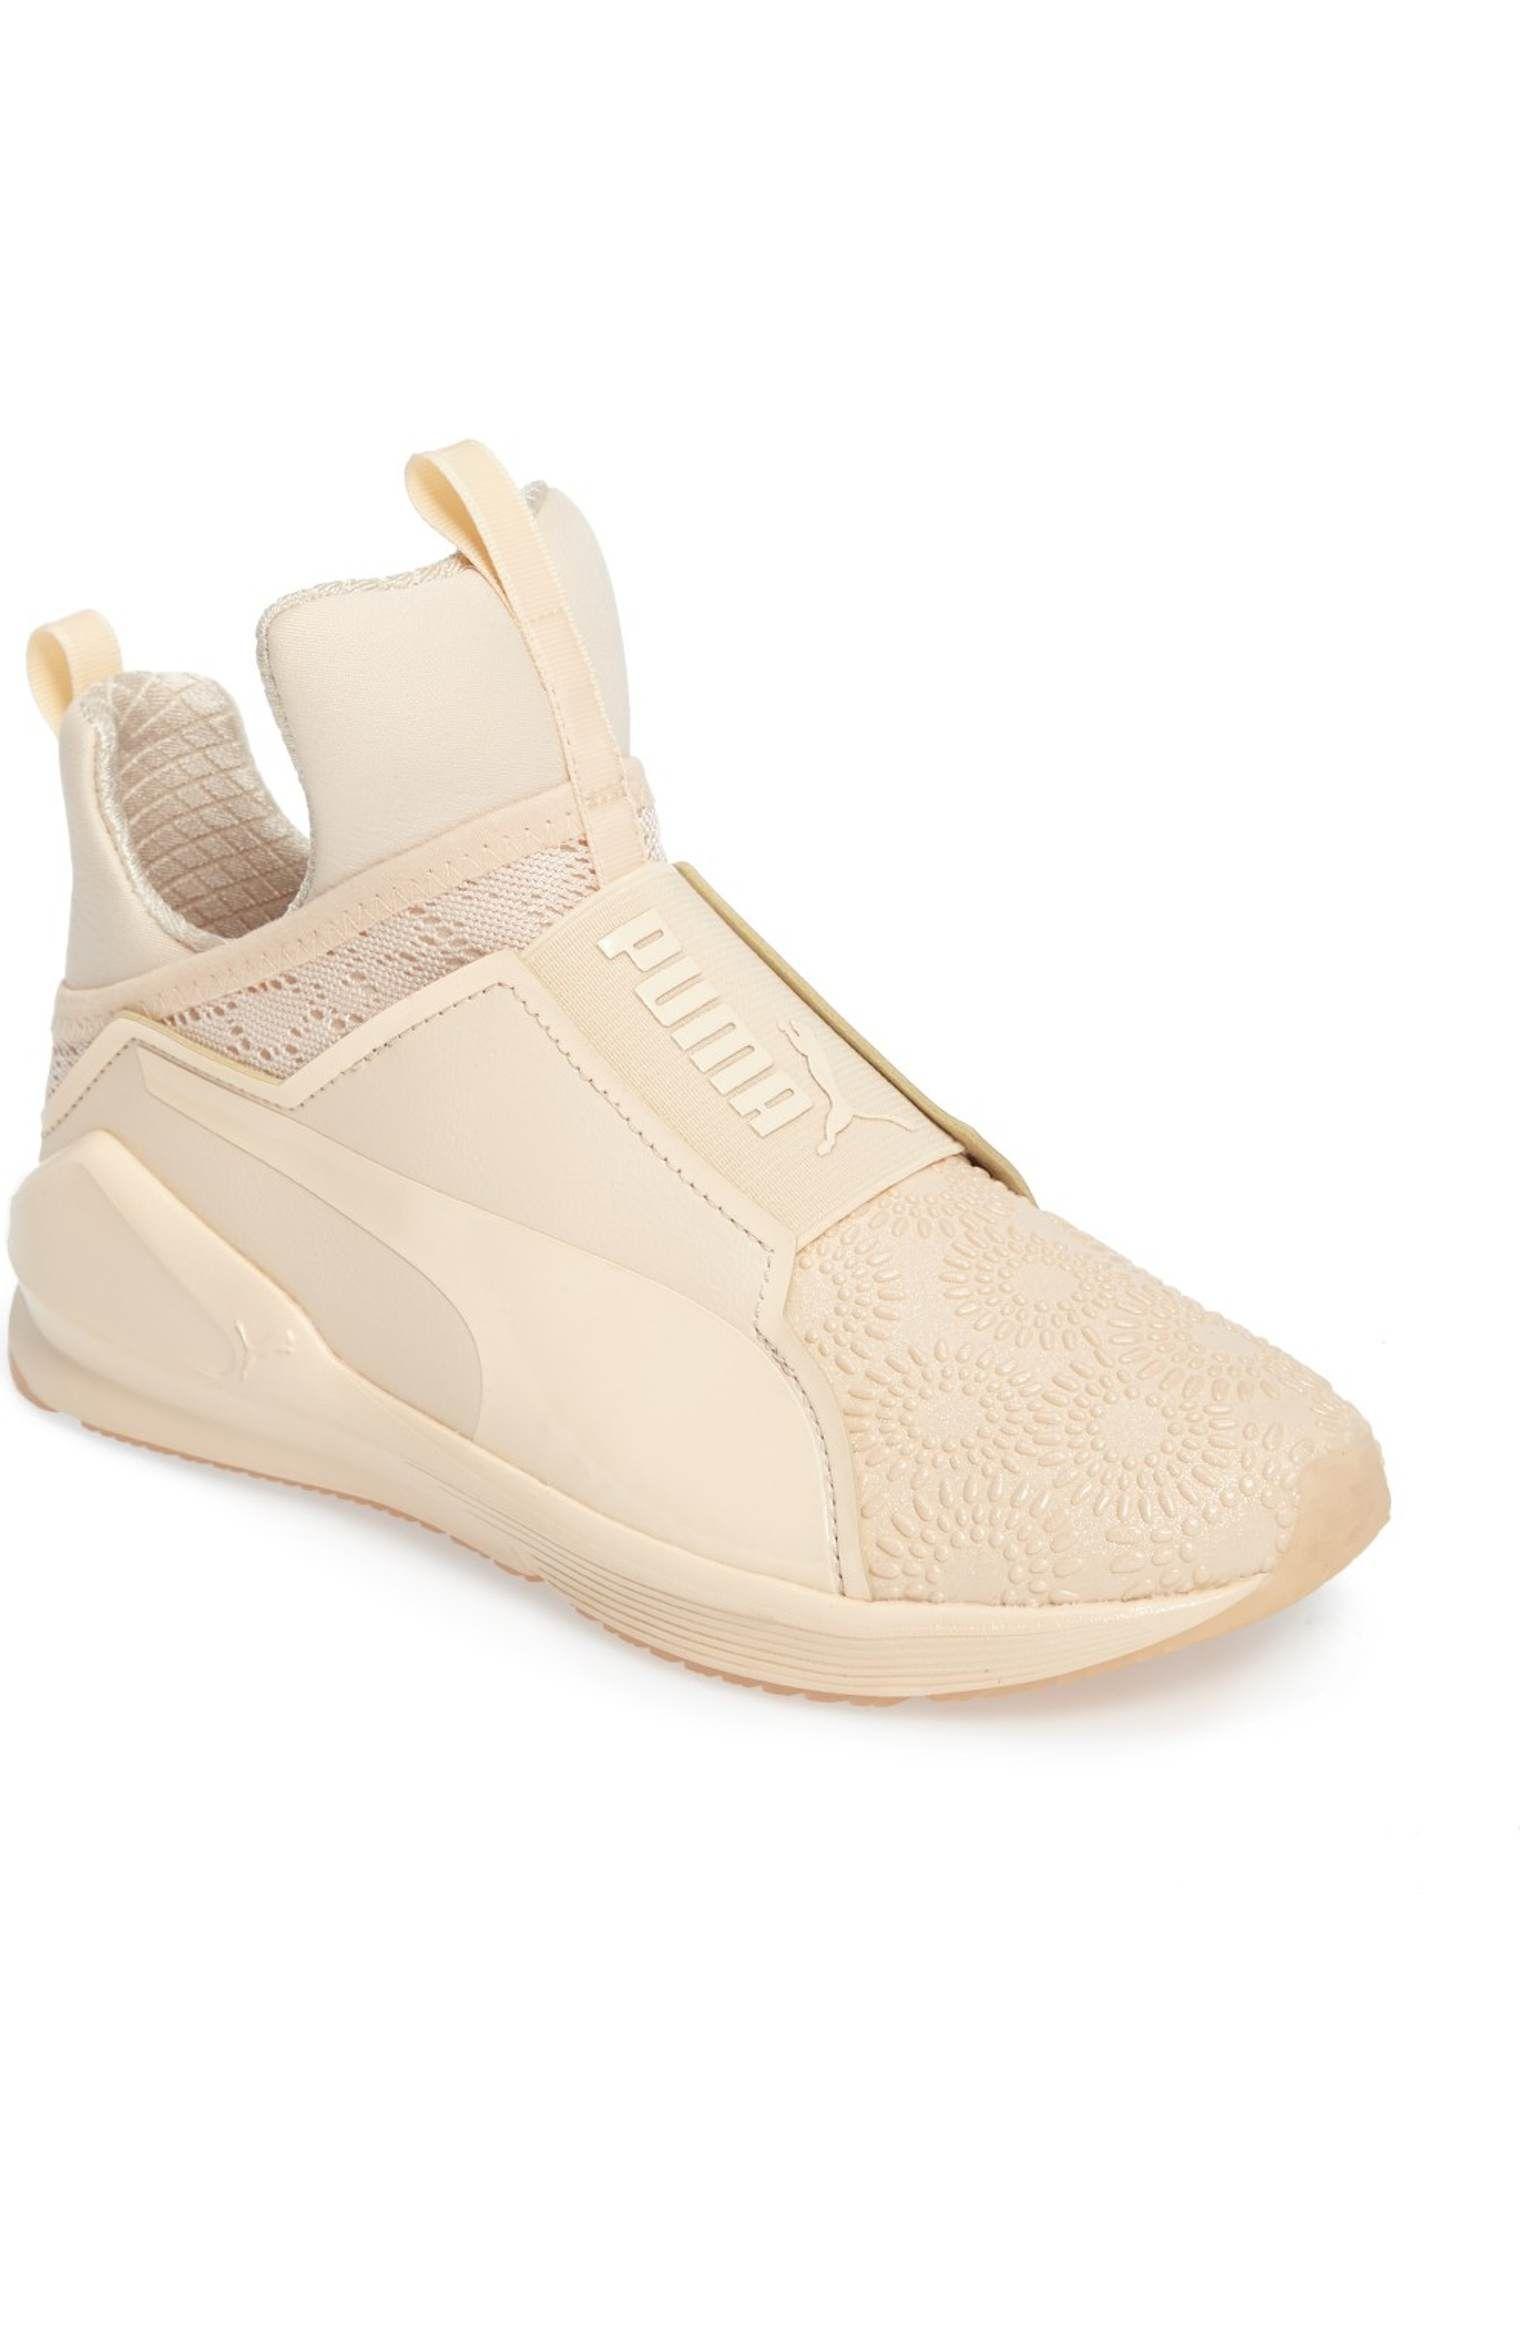 68a2767aeadf Main Image - PUMA FENTY by Rihanna Fierce KRM High Top Sneaker (Women)